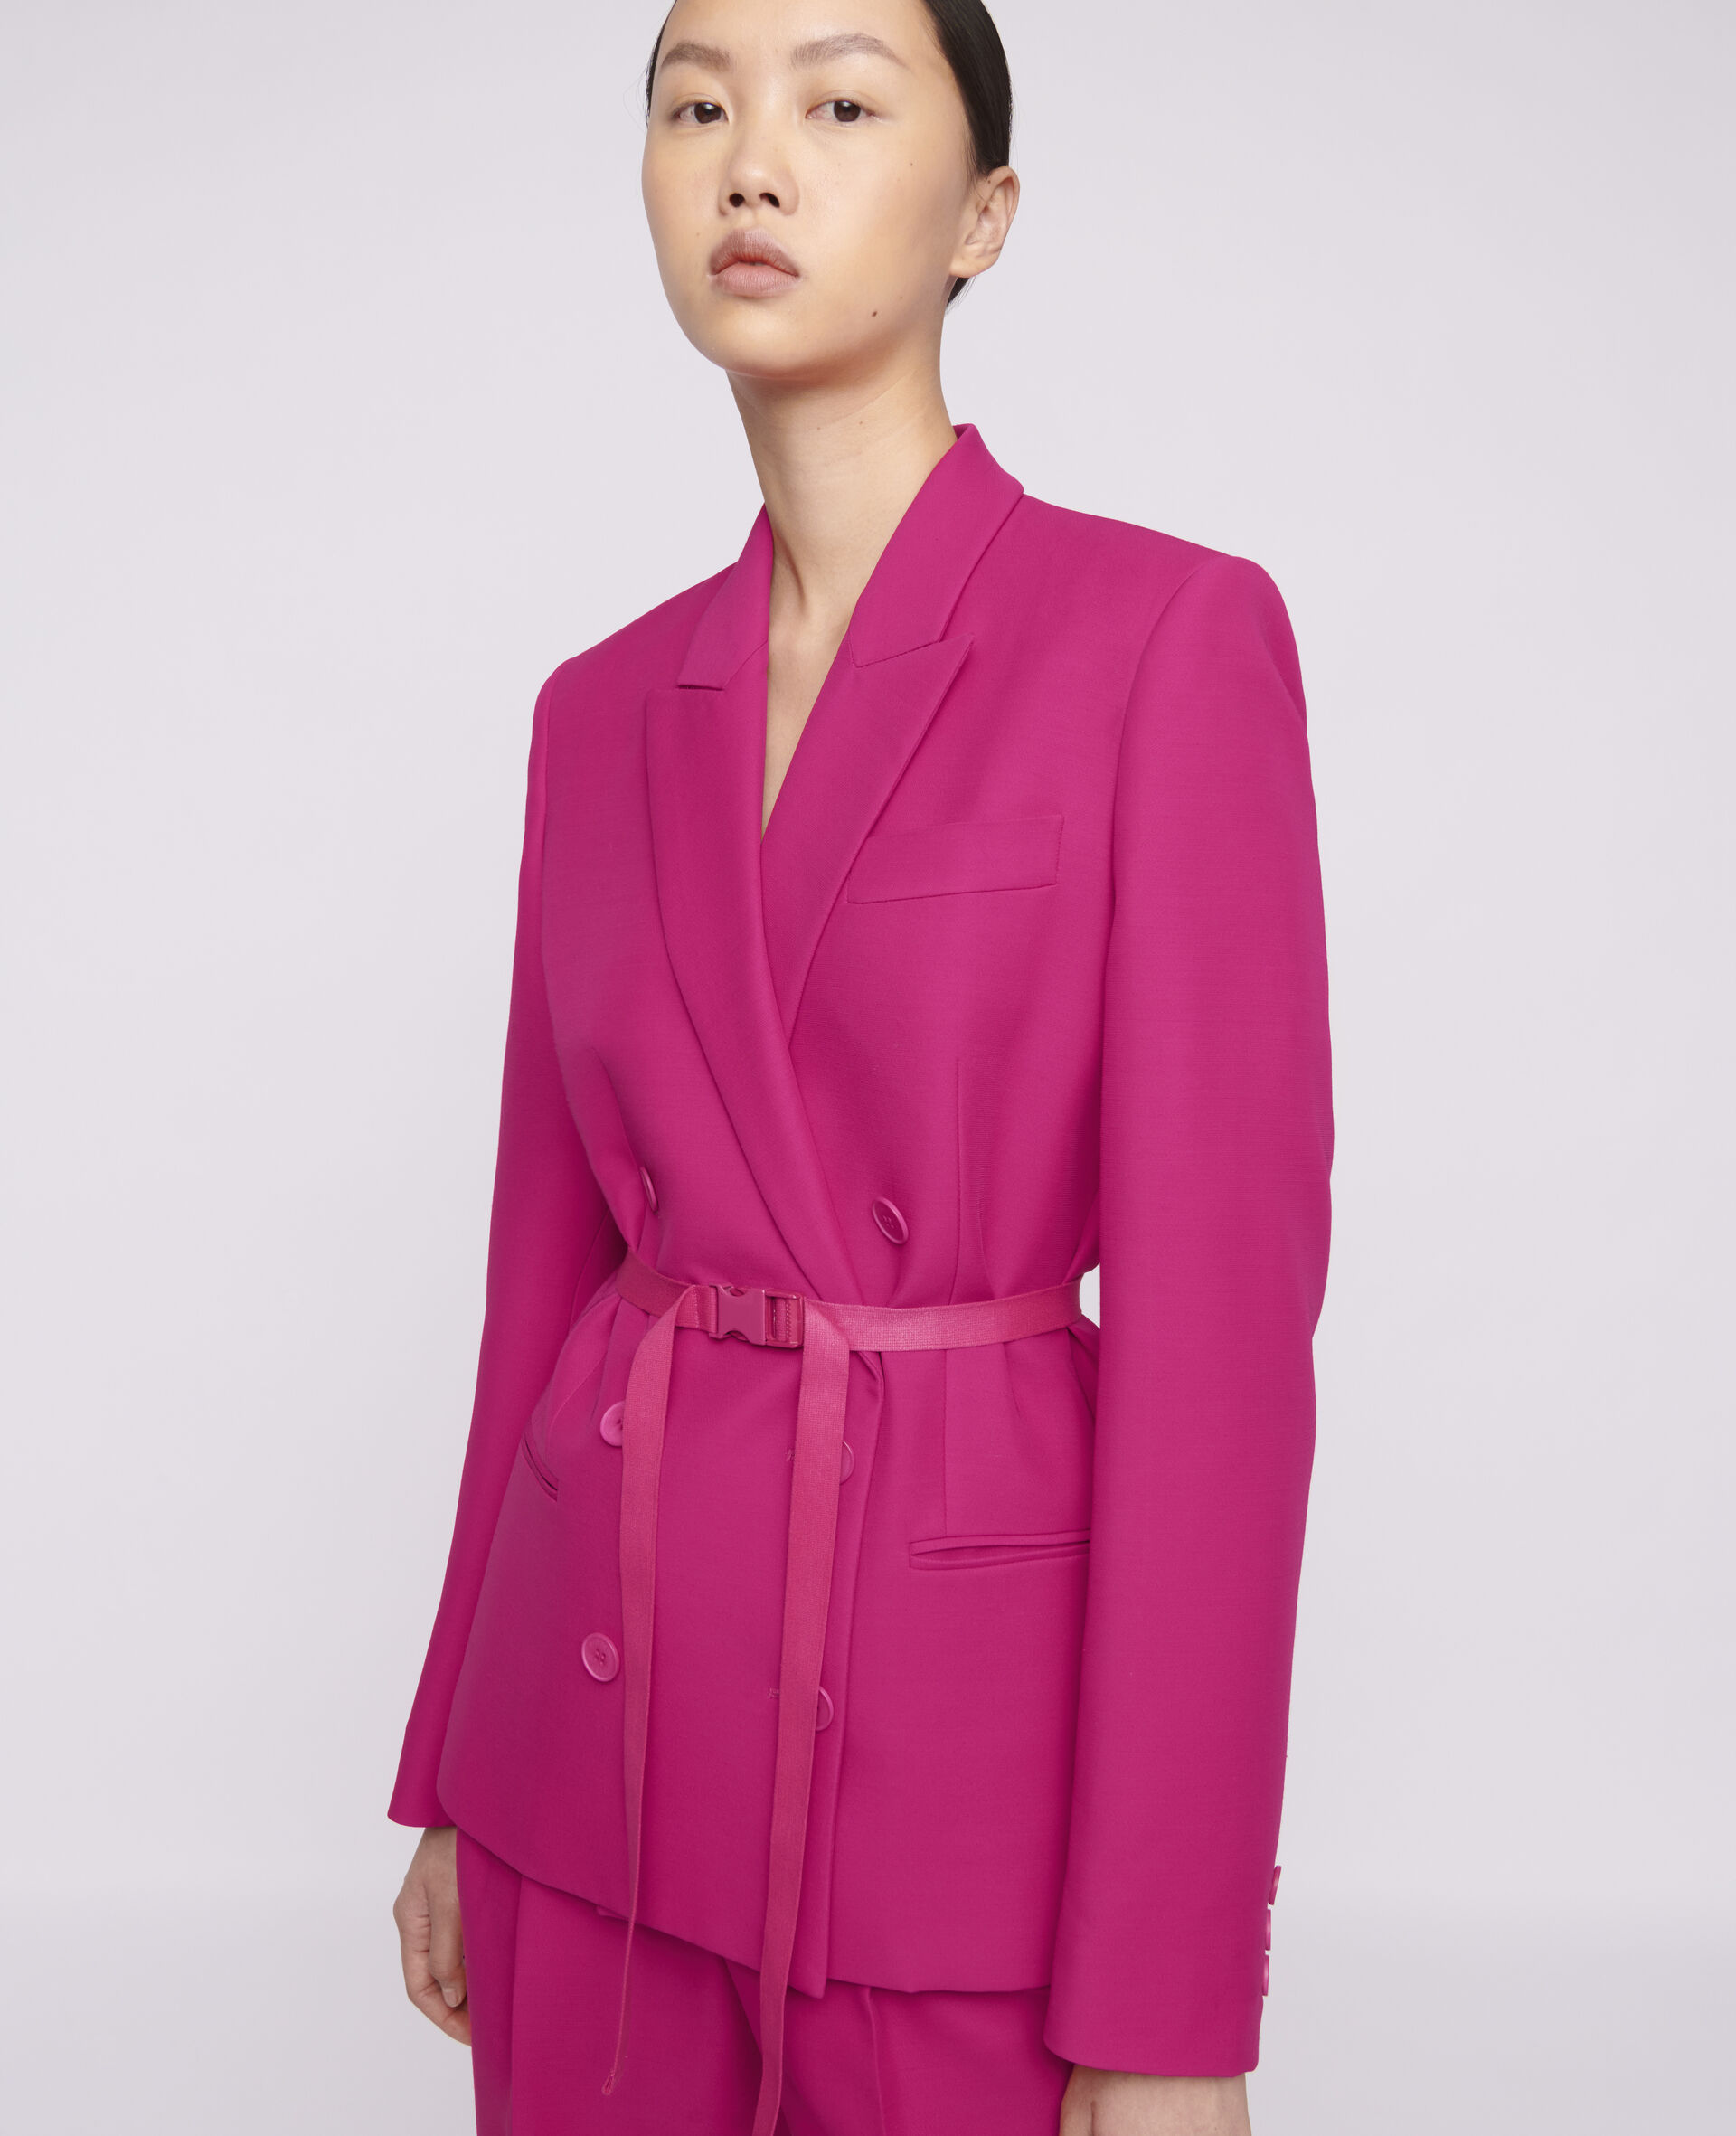 Lisa Tailored Jacket-Pink-large image number 3